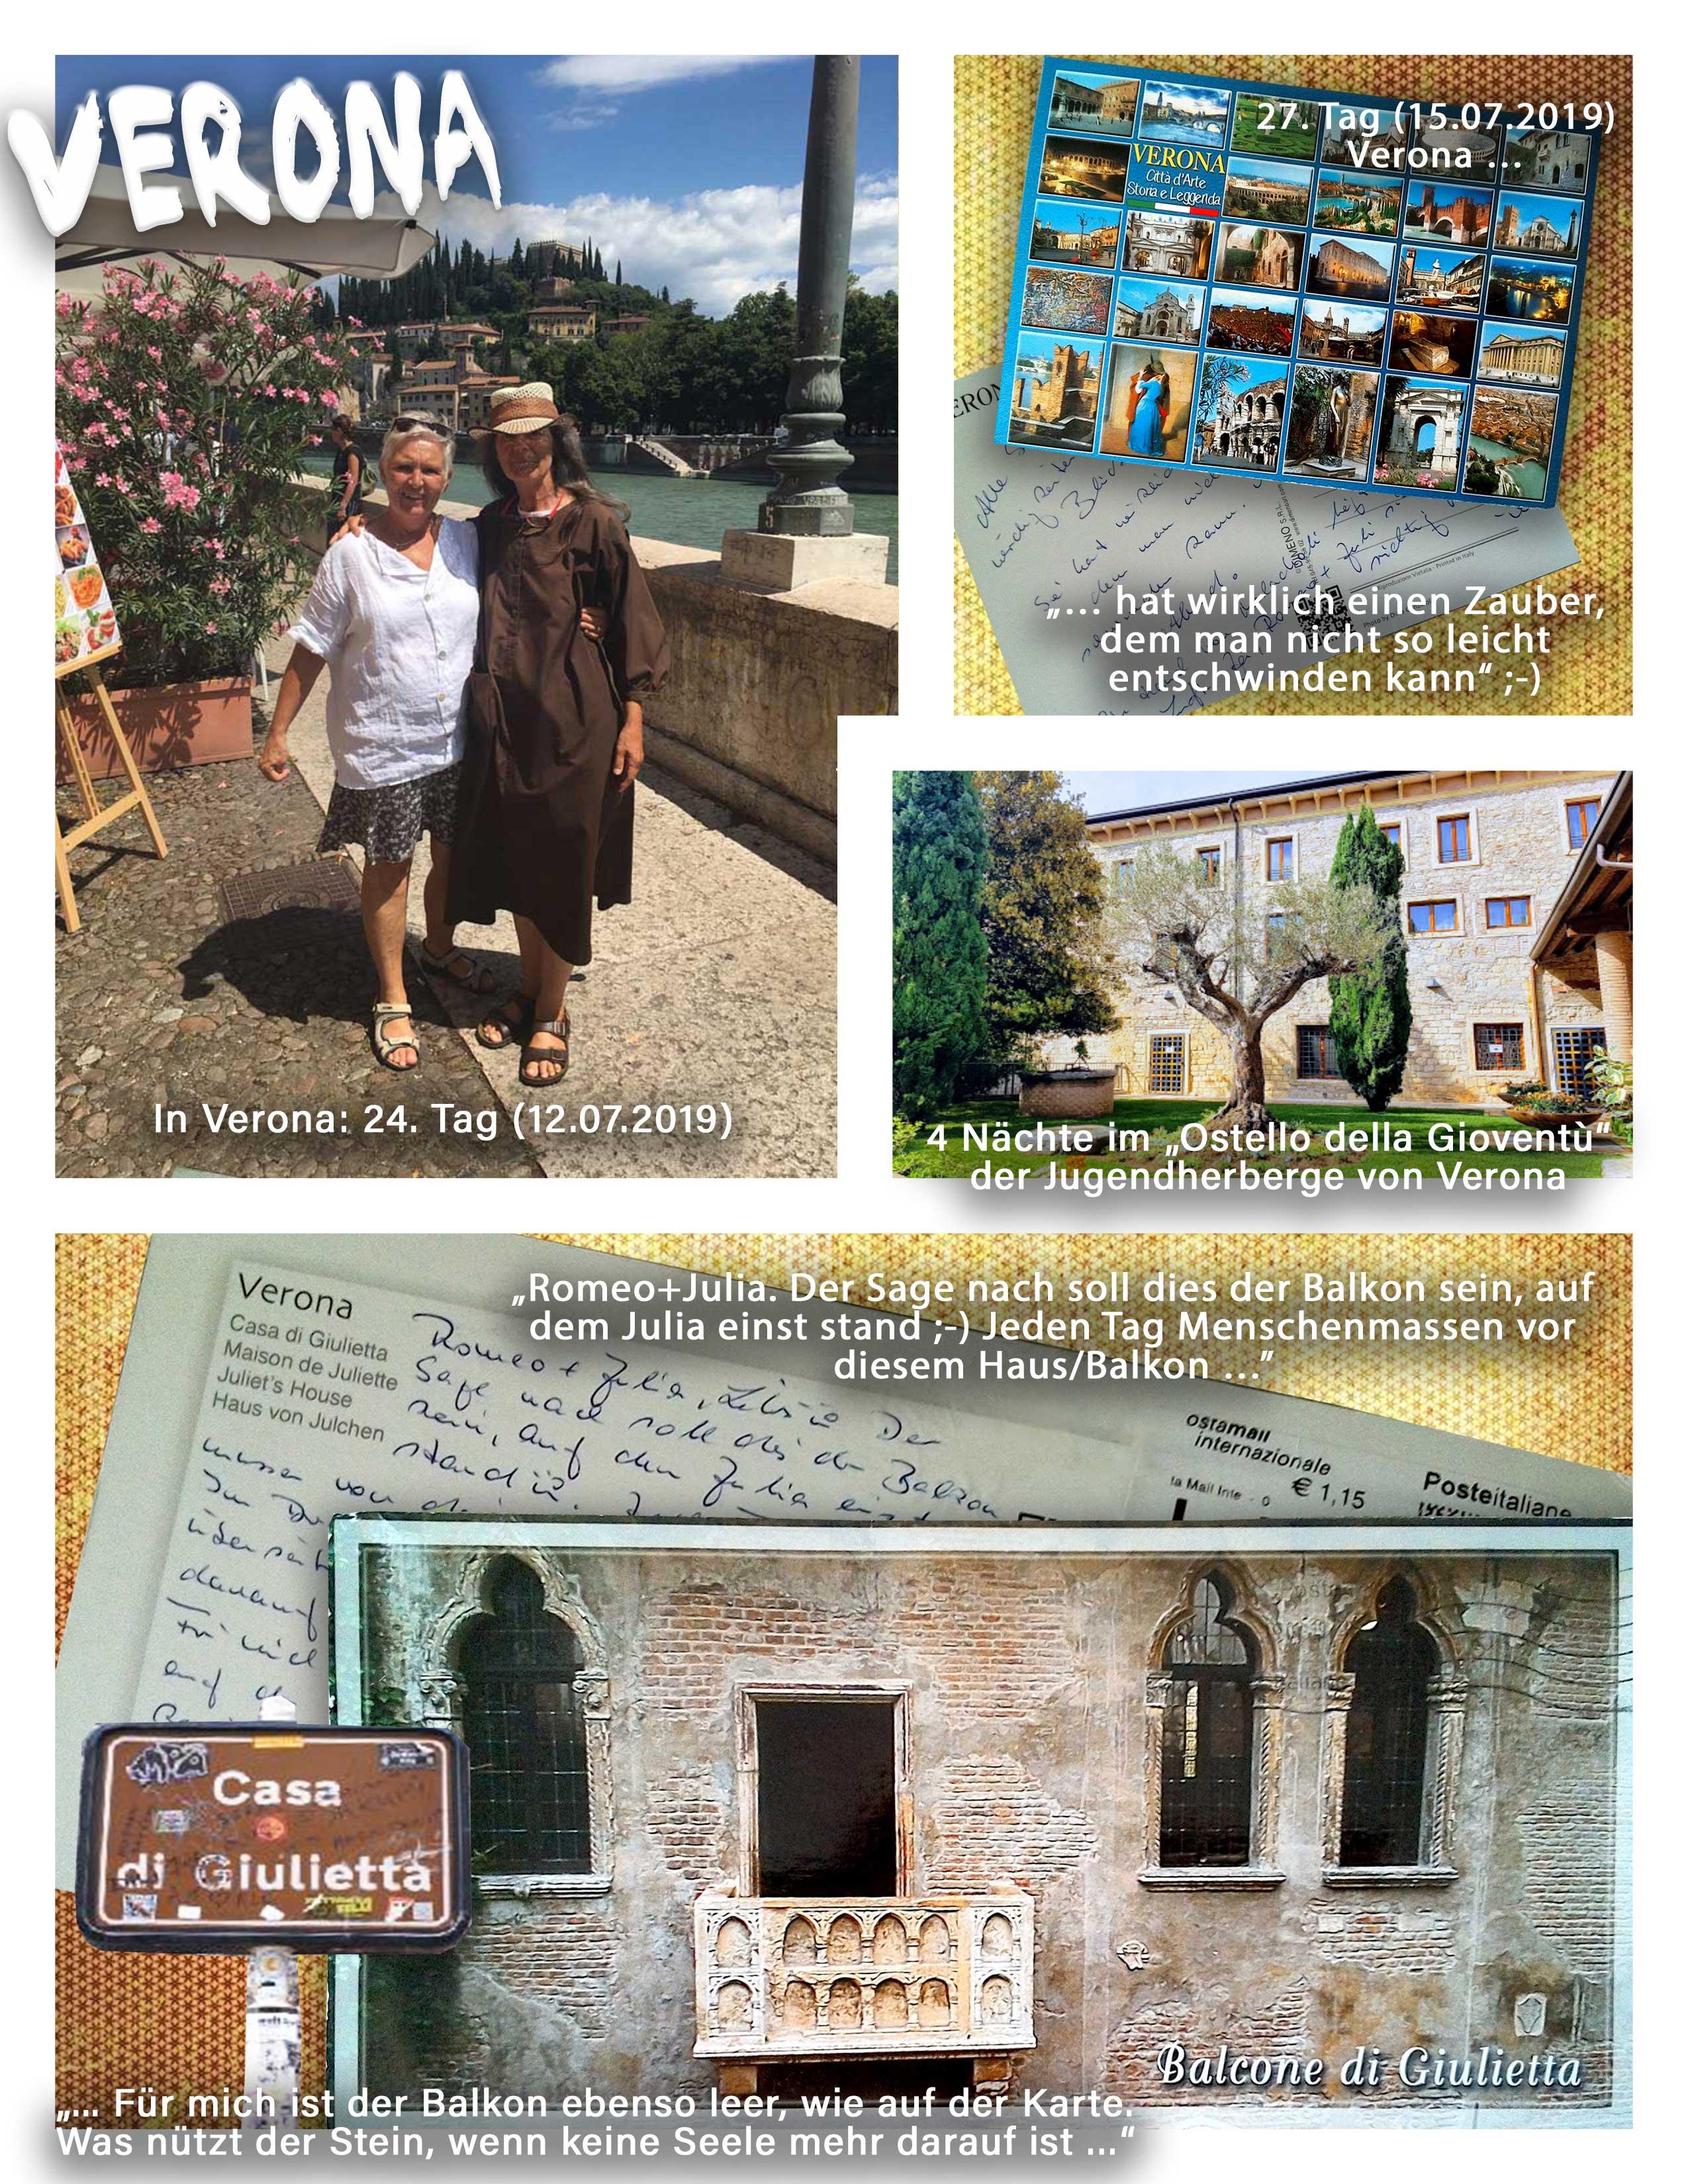 verona-romeo-julia-zweite-pilgerreise-zu-fuss-nach-rom